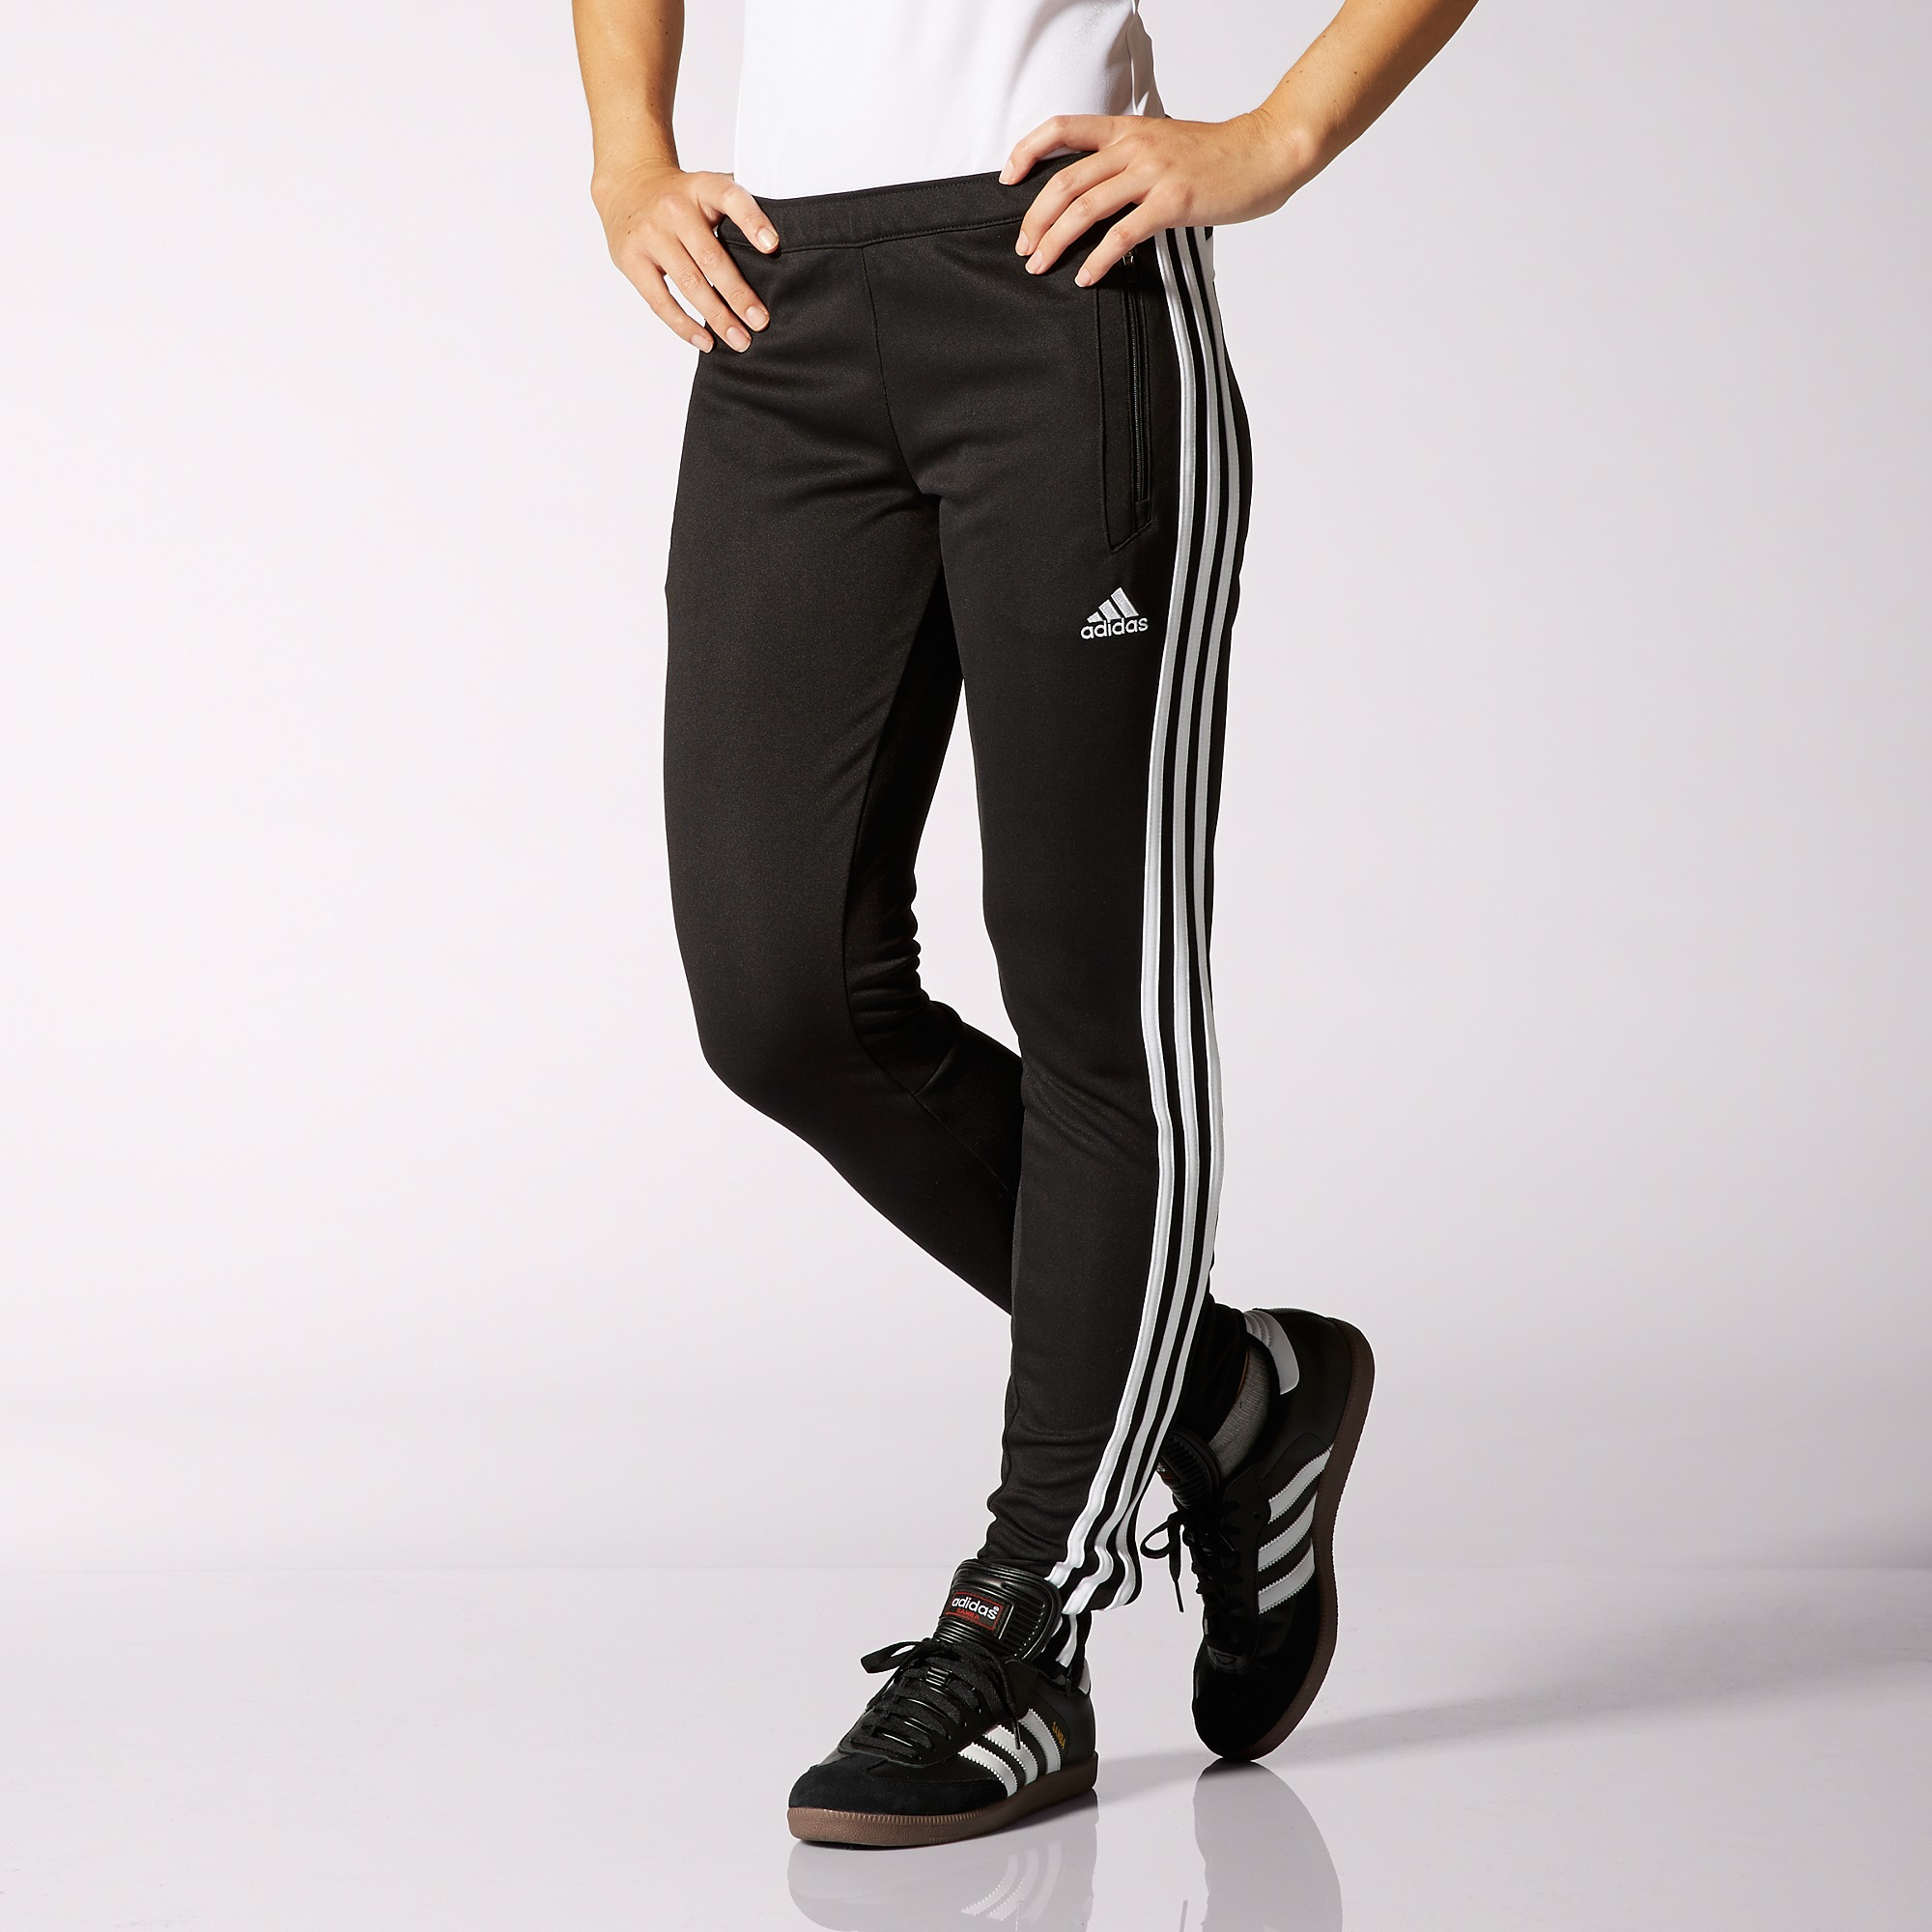 Adidas Sweatpants Womens